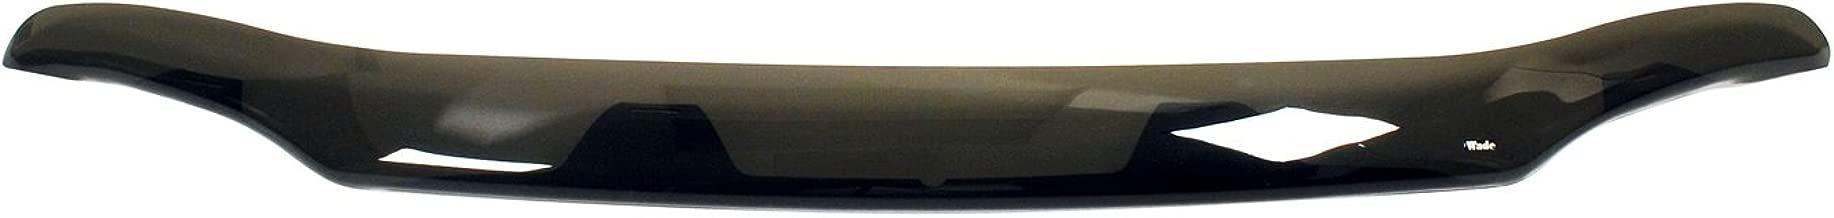 Smoke Bug Shield, Chevy Avalanche w/o body cladding 02-06 Silverado 1500 Classic 05-07 Silverado 03-05